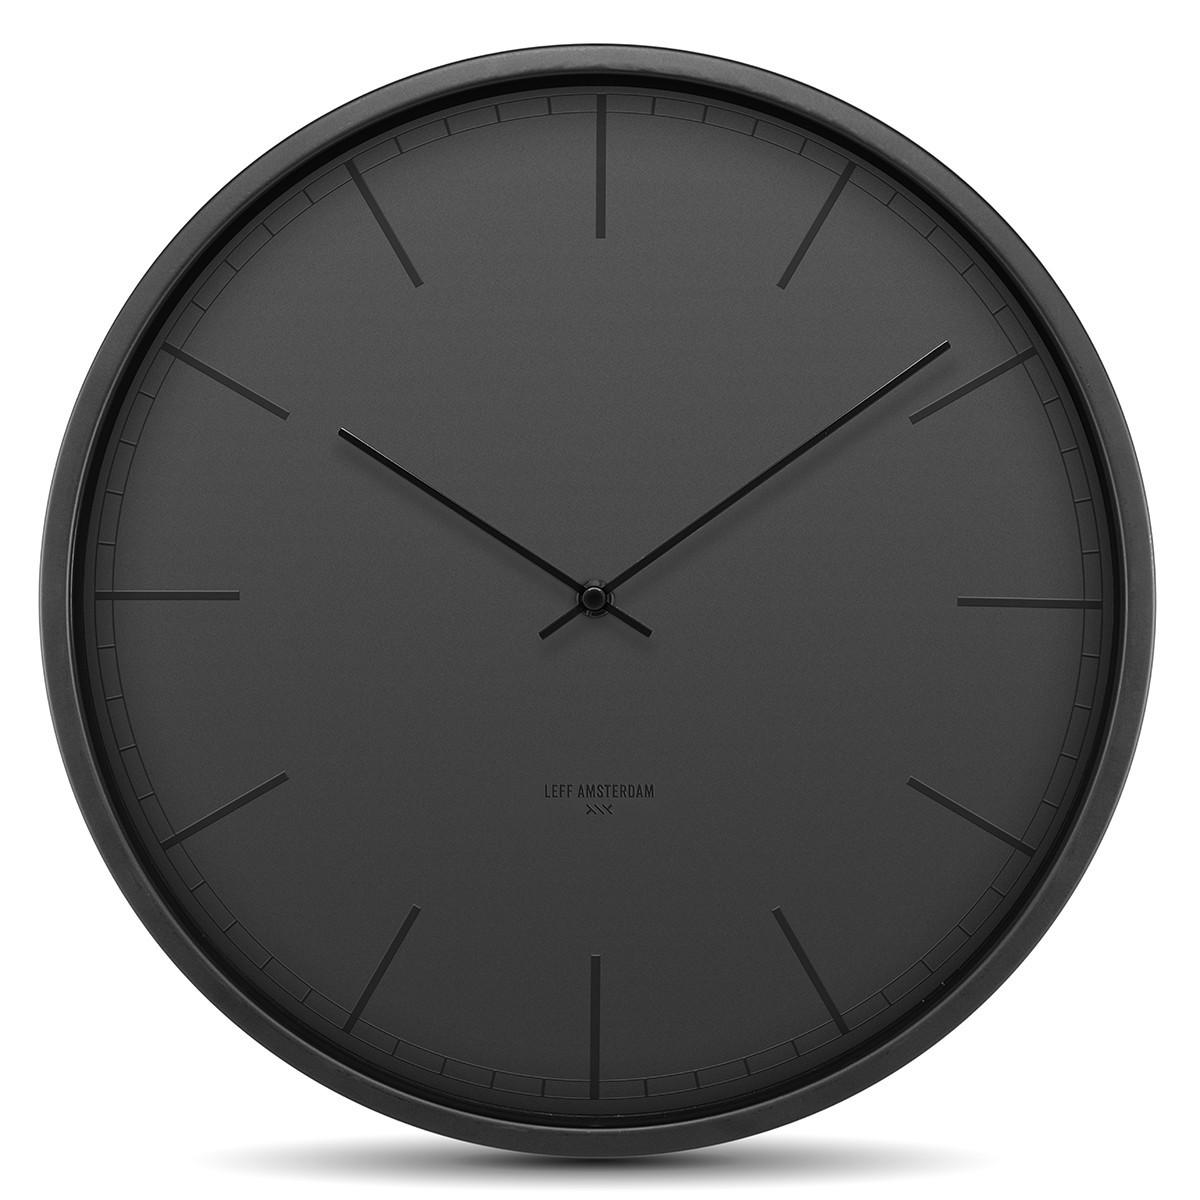 Huygens: Tone 35 Wall Clock image